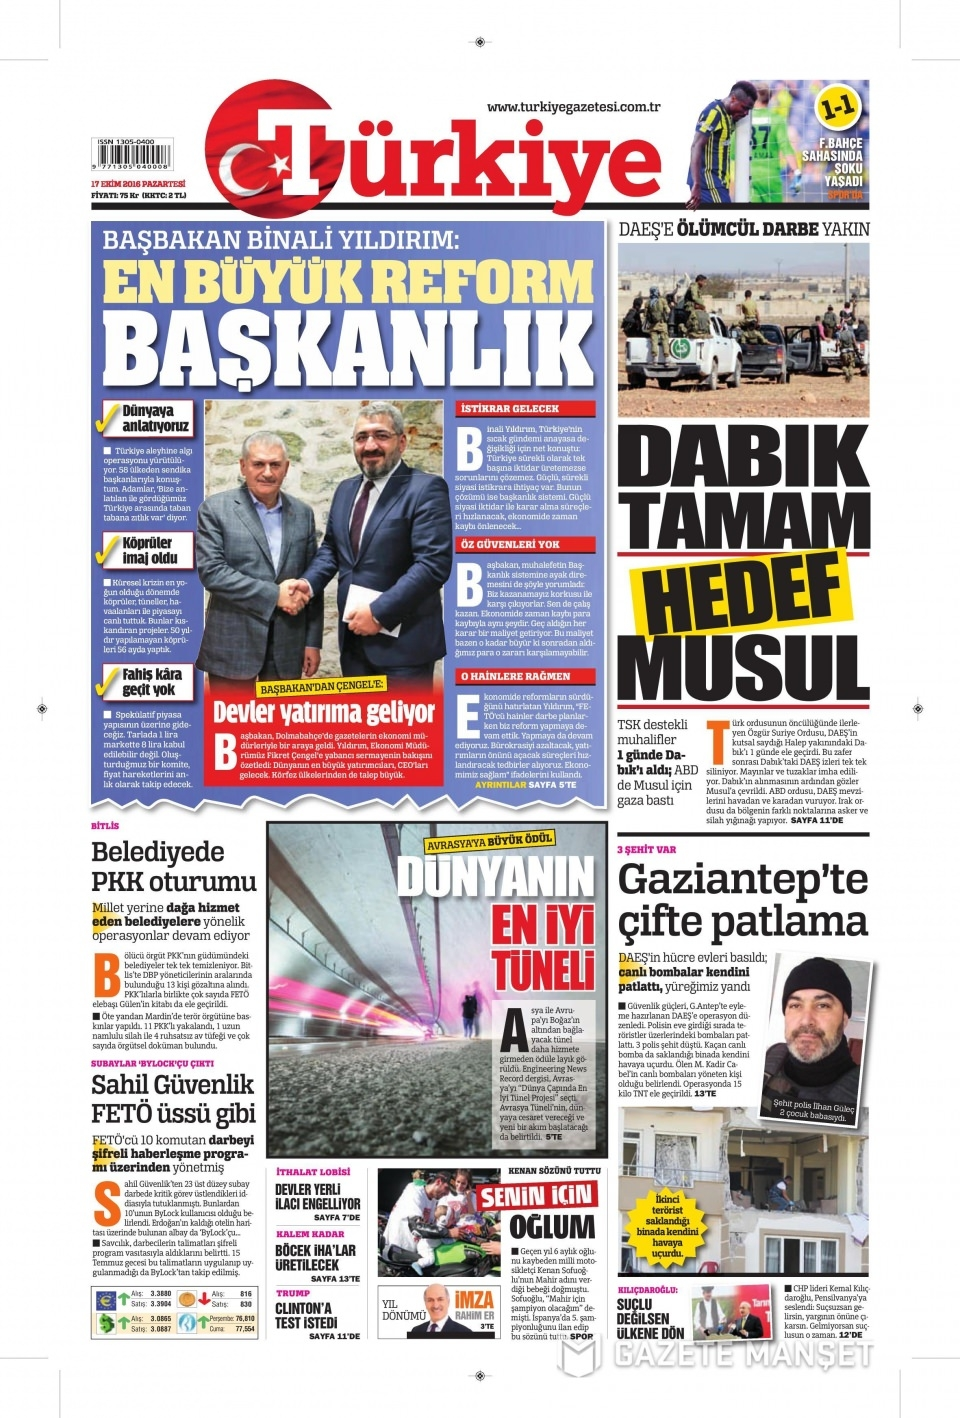 17 Ekim Pazartesi gazete manşetleri 3